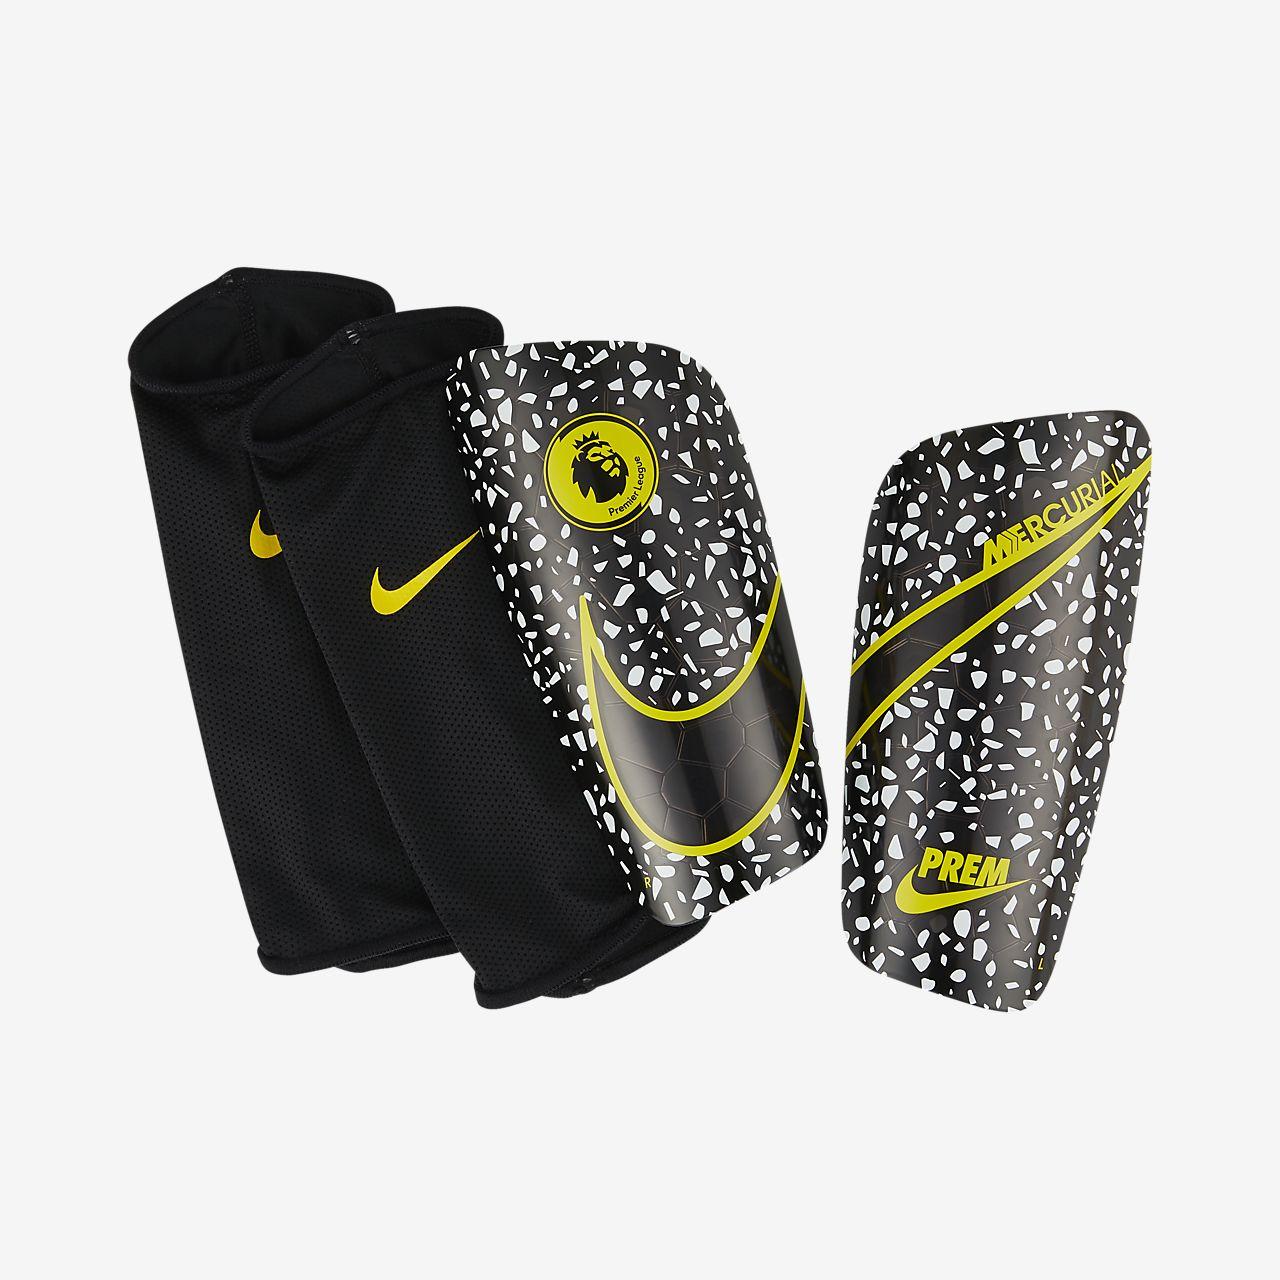 Nike Mercurial Lite 英超联赛耐克刺客系列足球护腿板(1对)